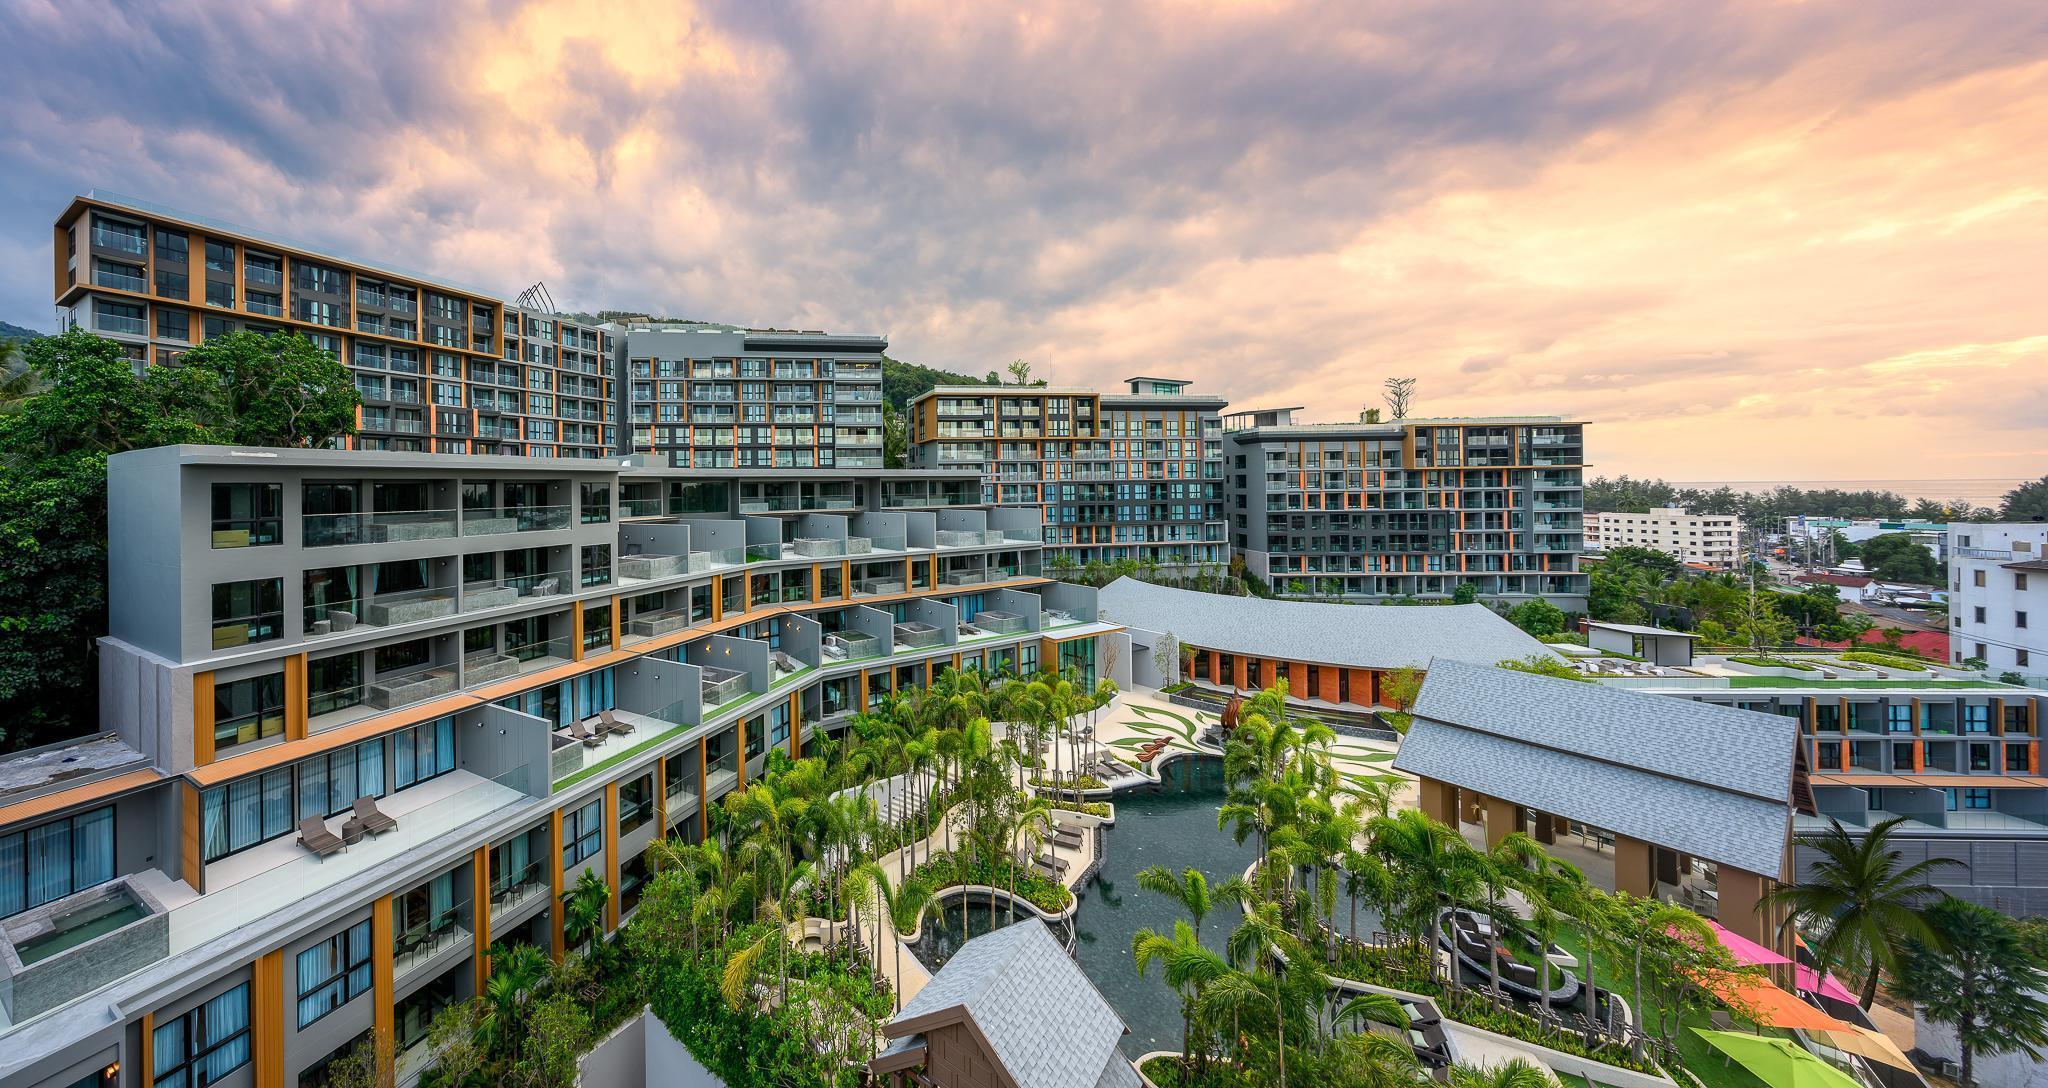 Mida Grande Resort Phuket ไมด้า กรันเด รีสอร์ต ภูเก็ต